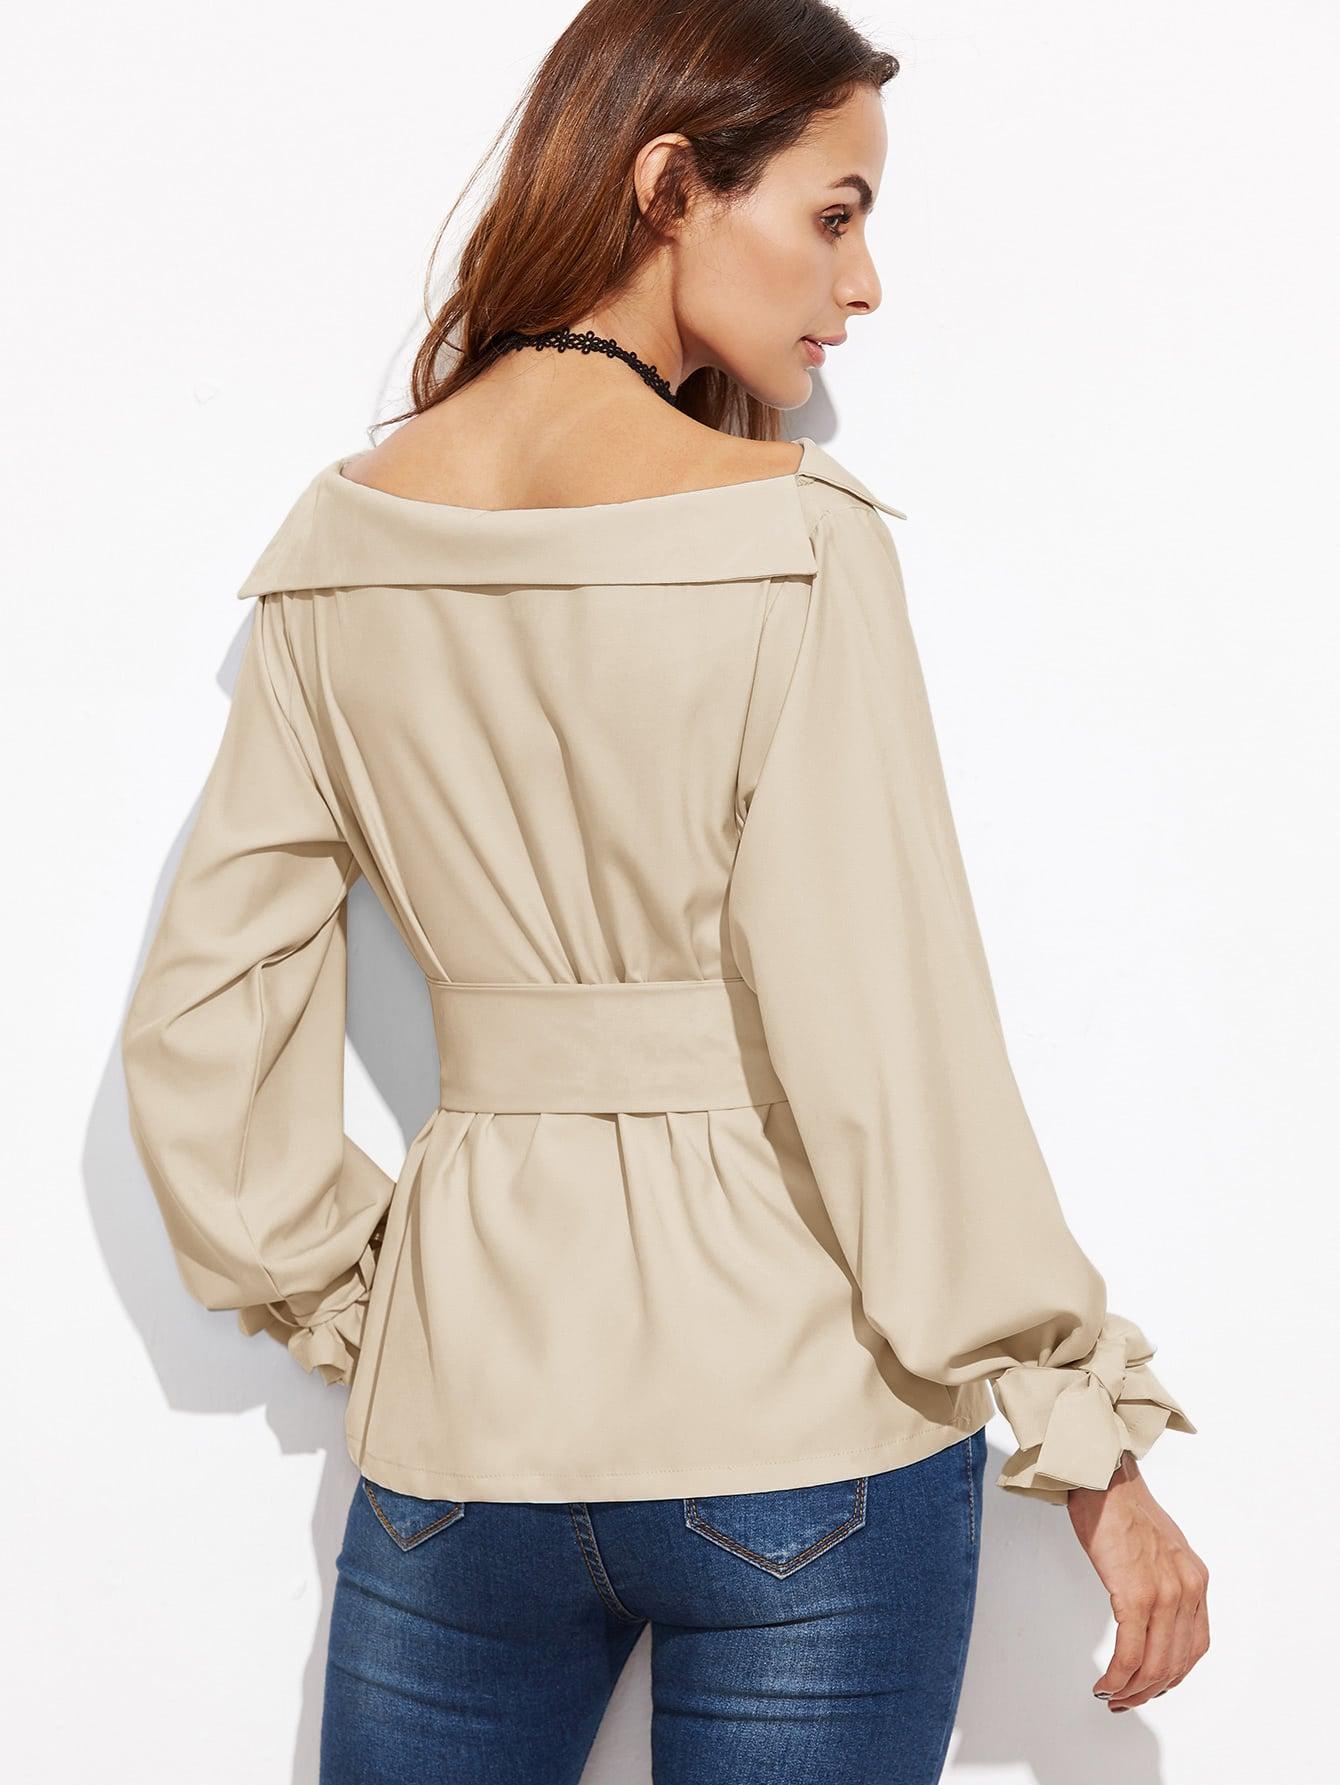 blouse161101492_2